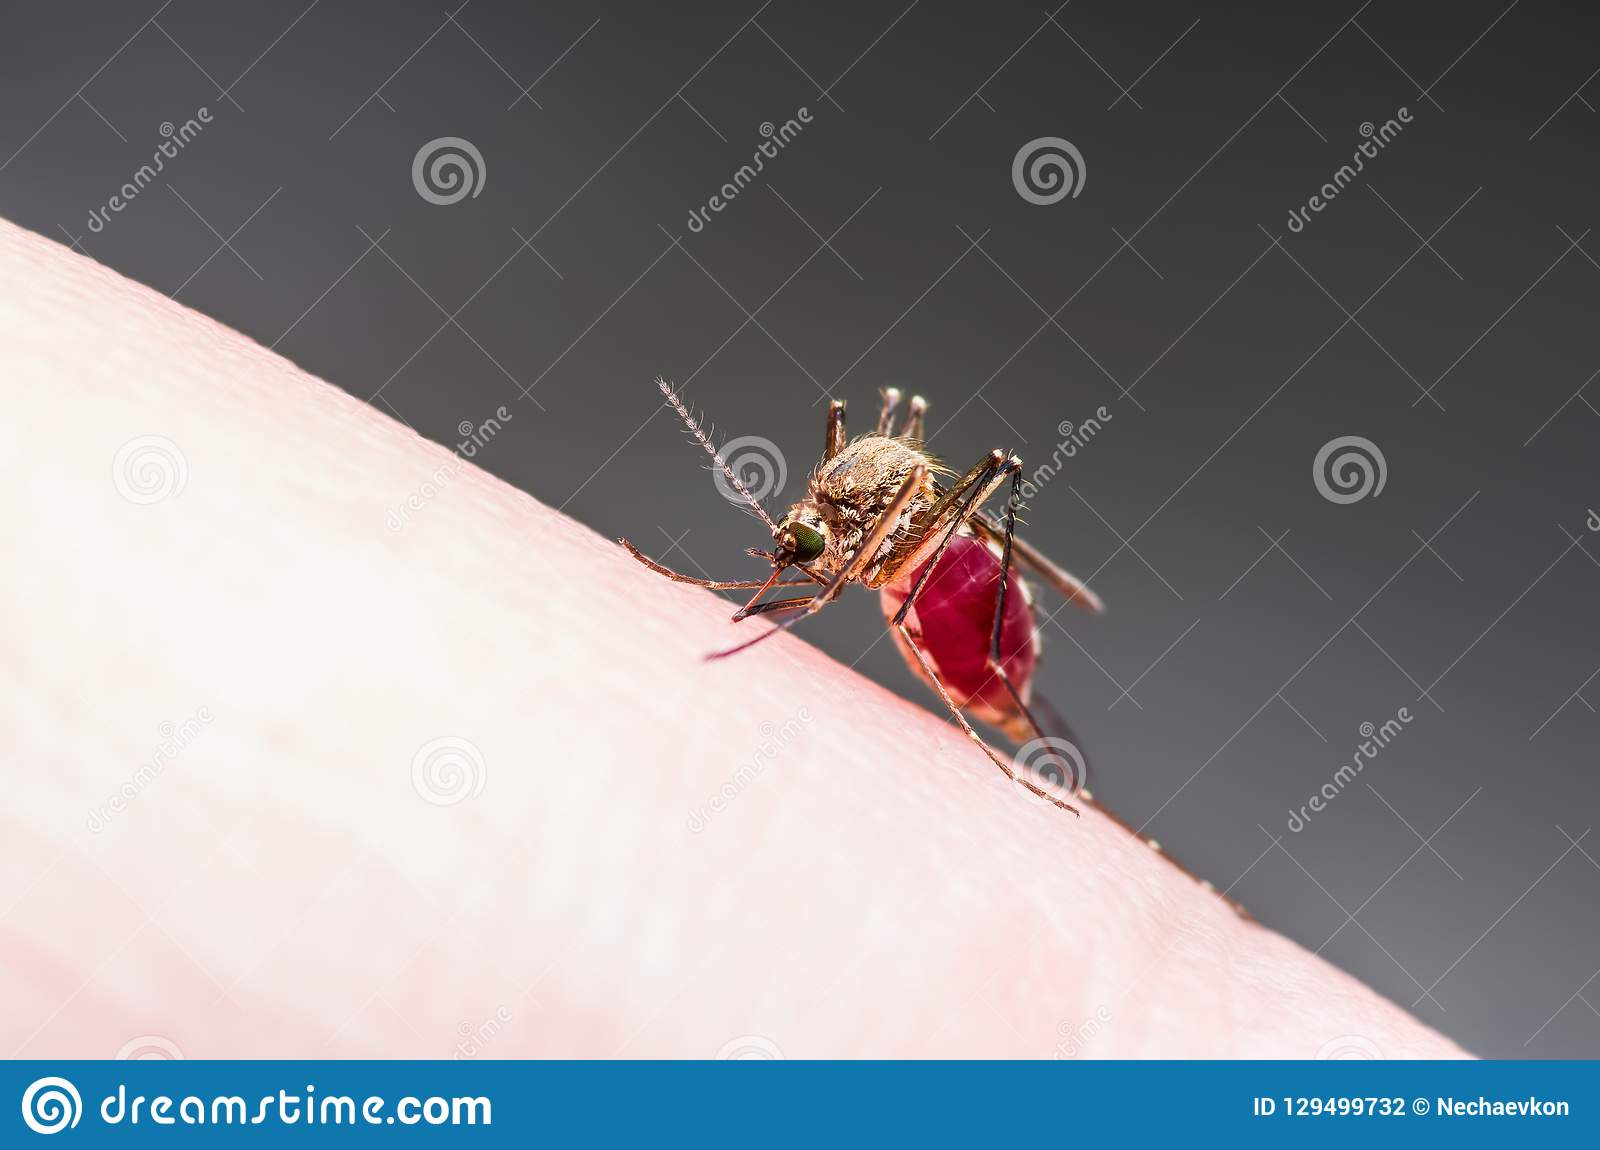 Macro infectada virus del insecto de la fiebre amarilla, de la malaria o del mosquito de Zika